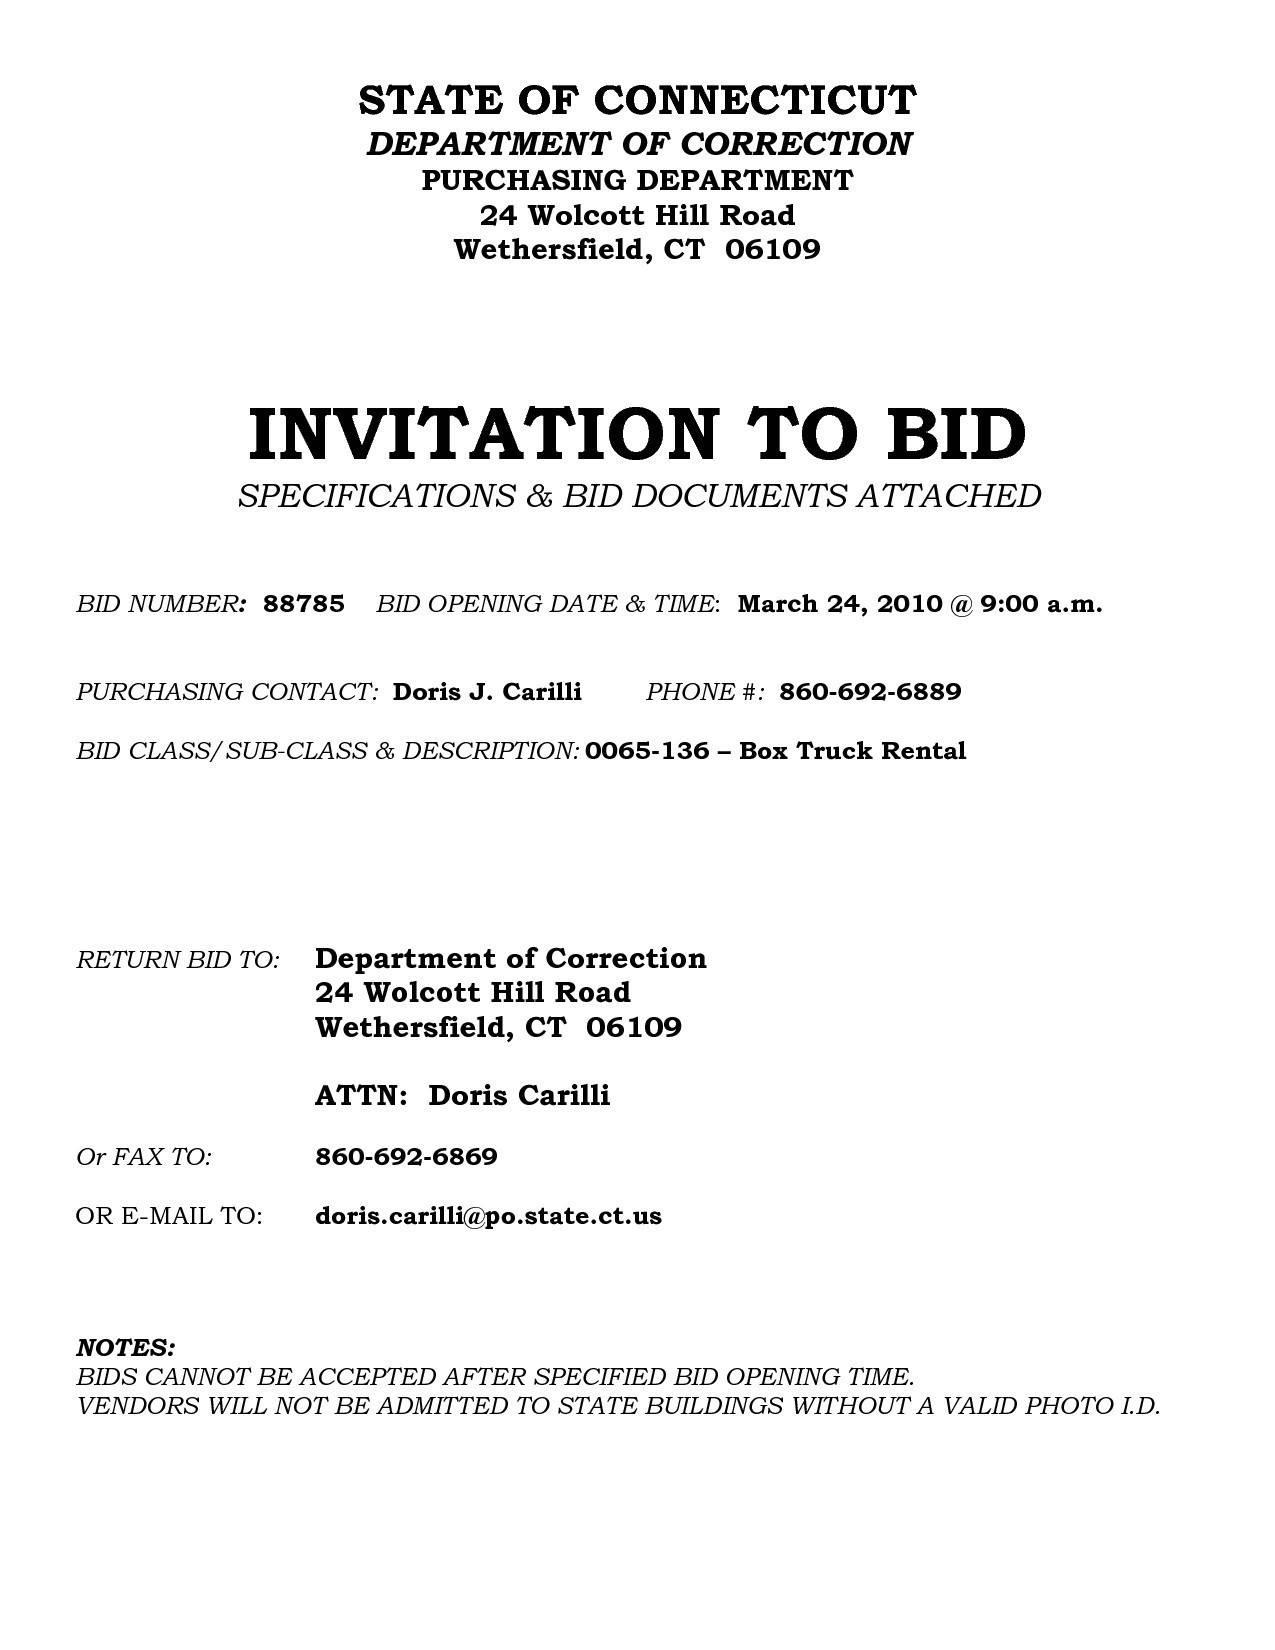 Invitation To Bid Template Free